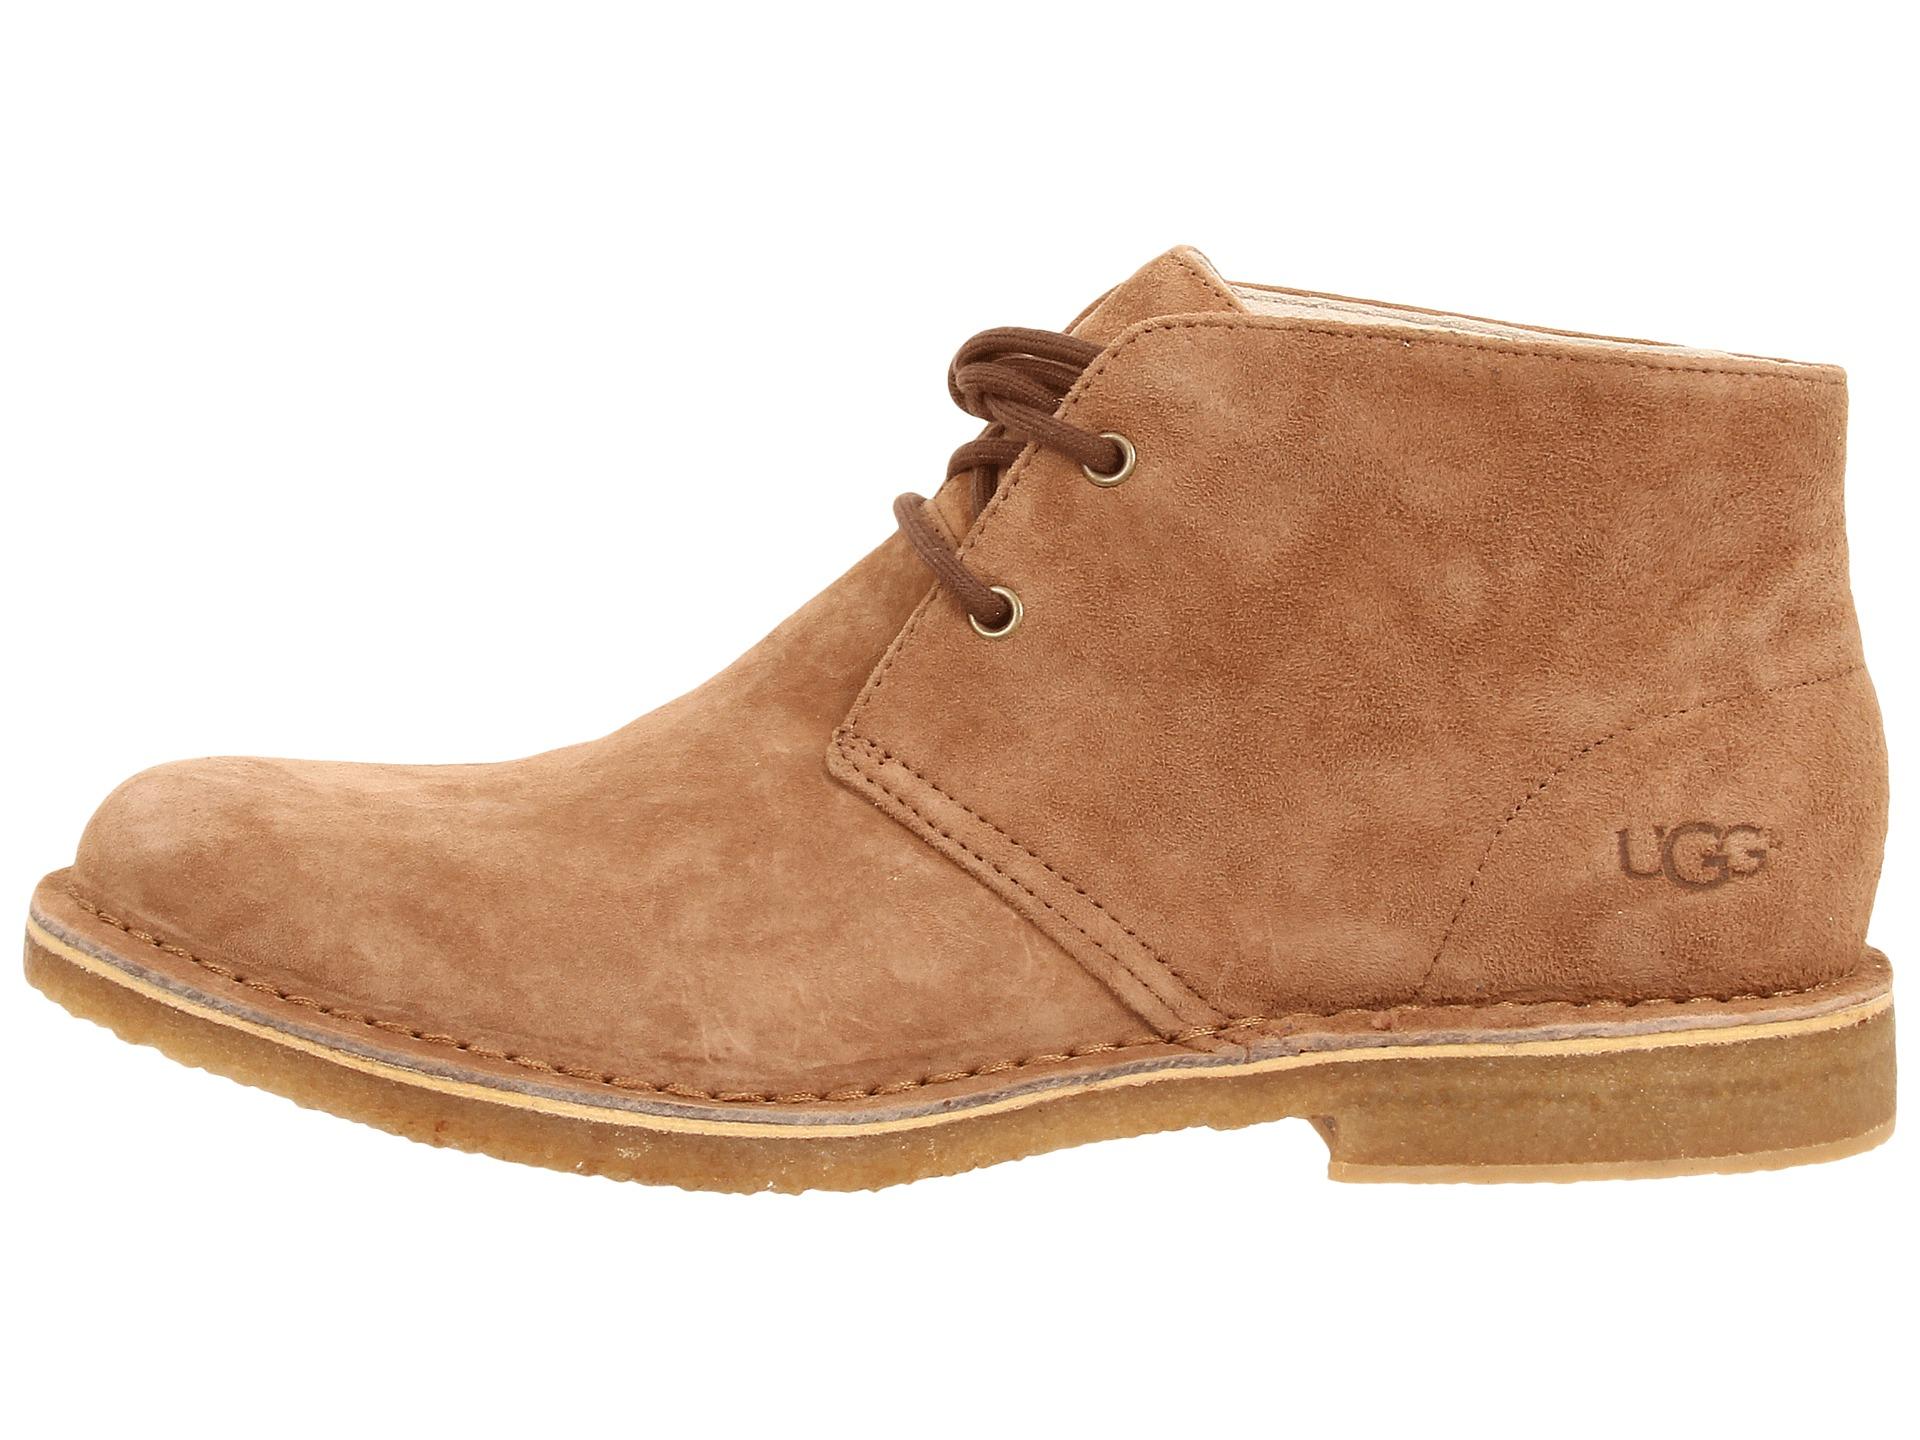 8aa232991ff Ugg Australia Leighton Leather Desert Boots - cheap watches mgc-gas.com